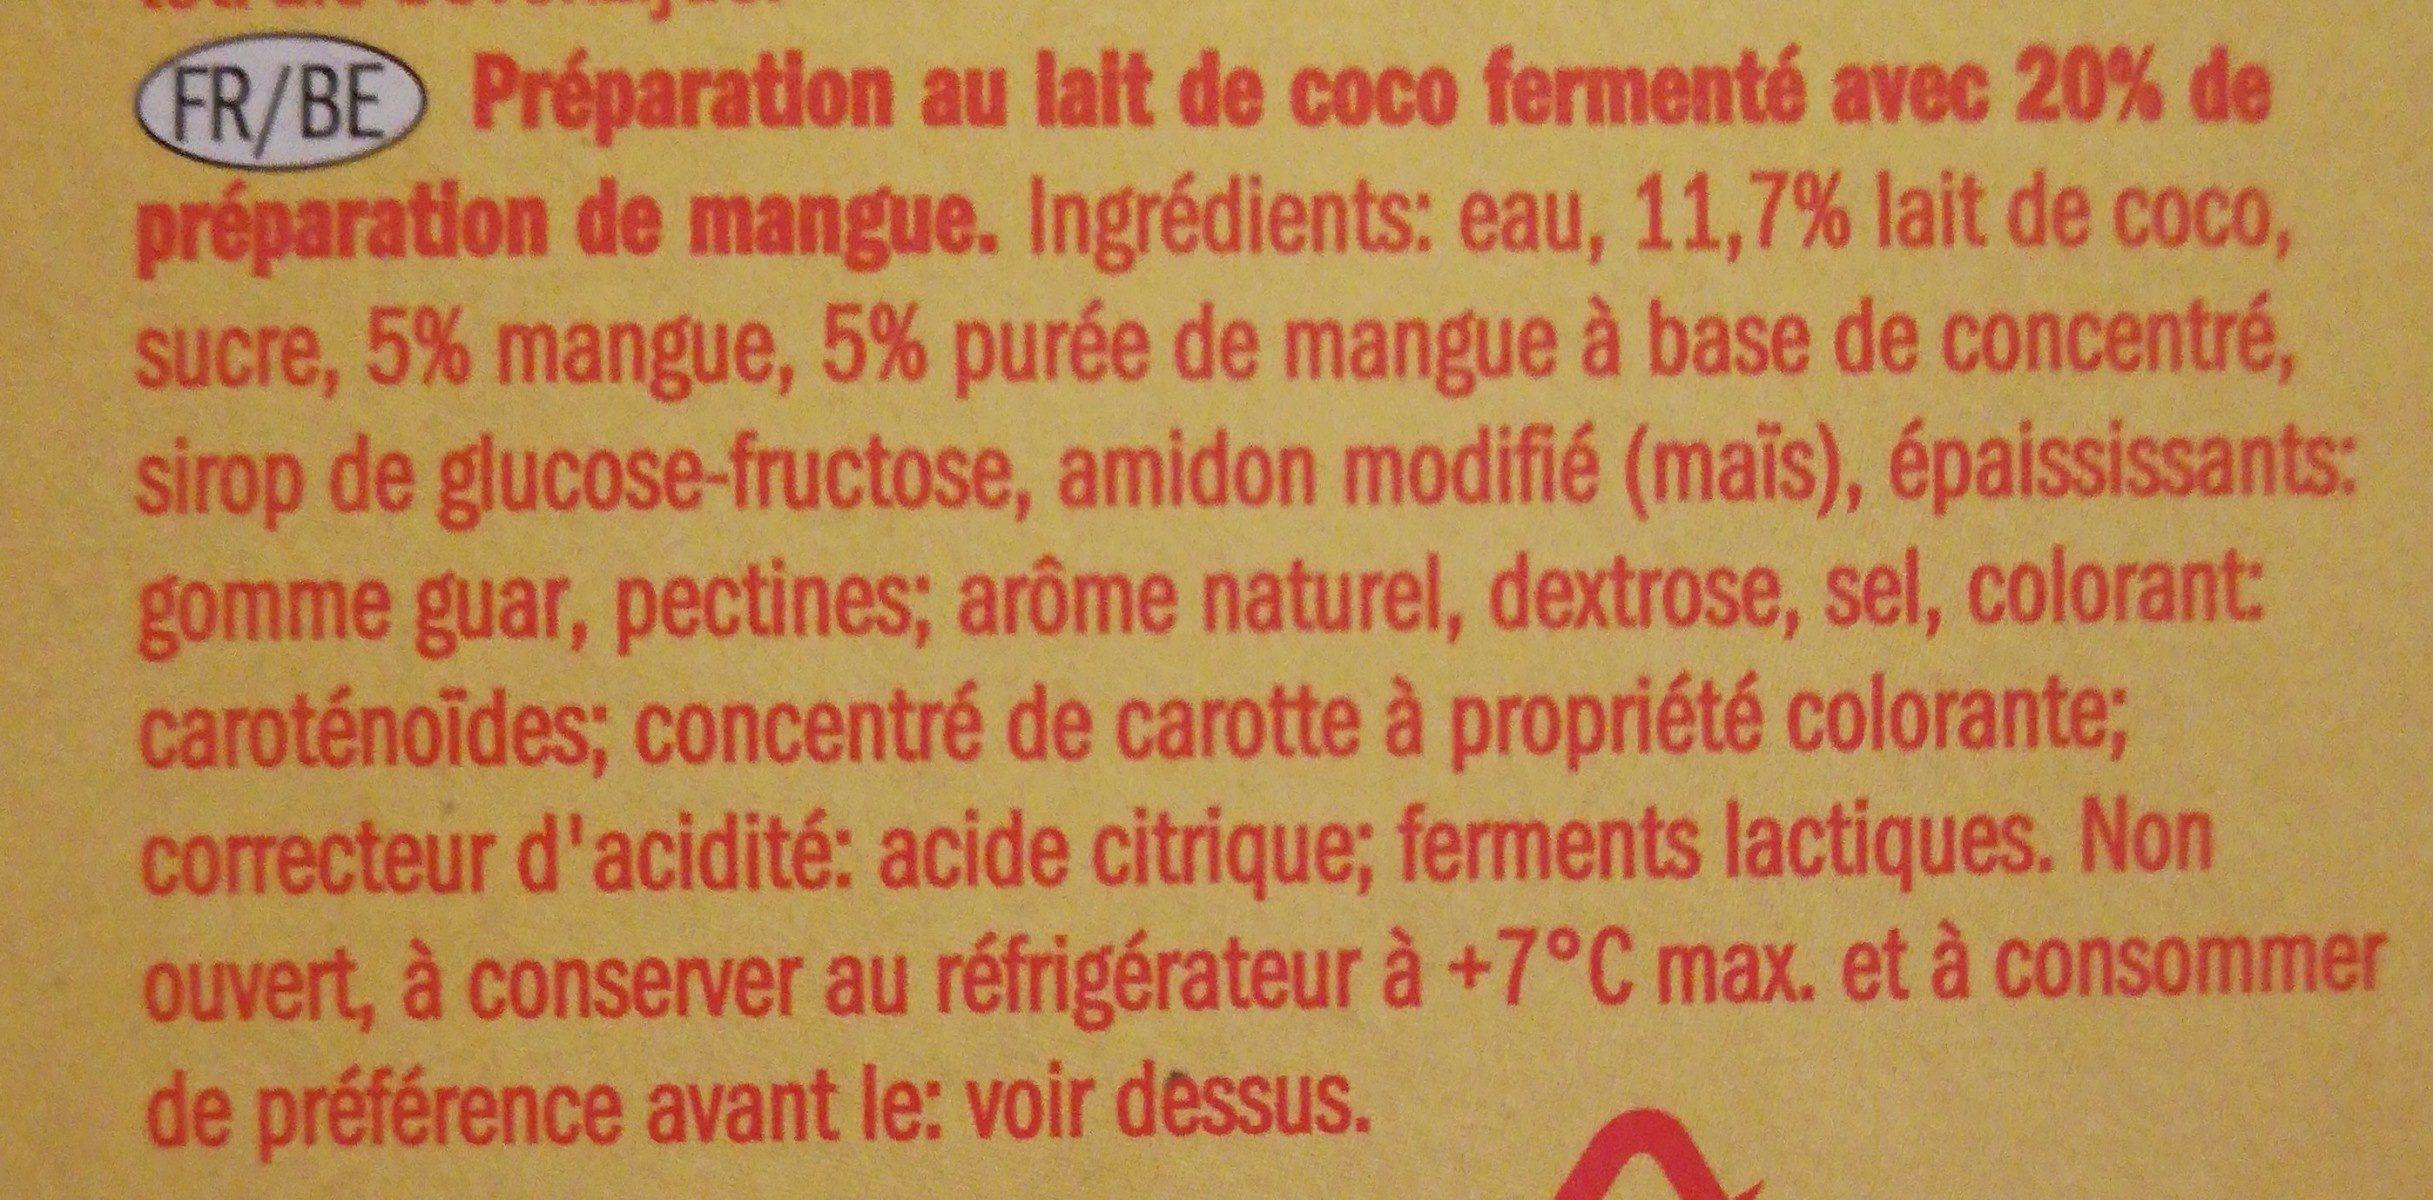 Coco mango - Ingrédients